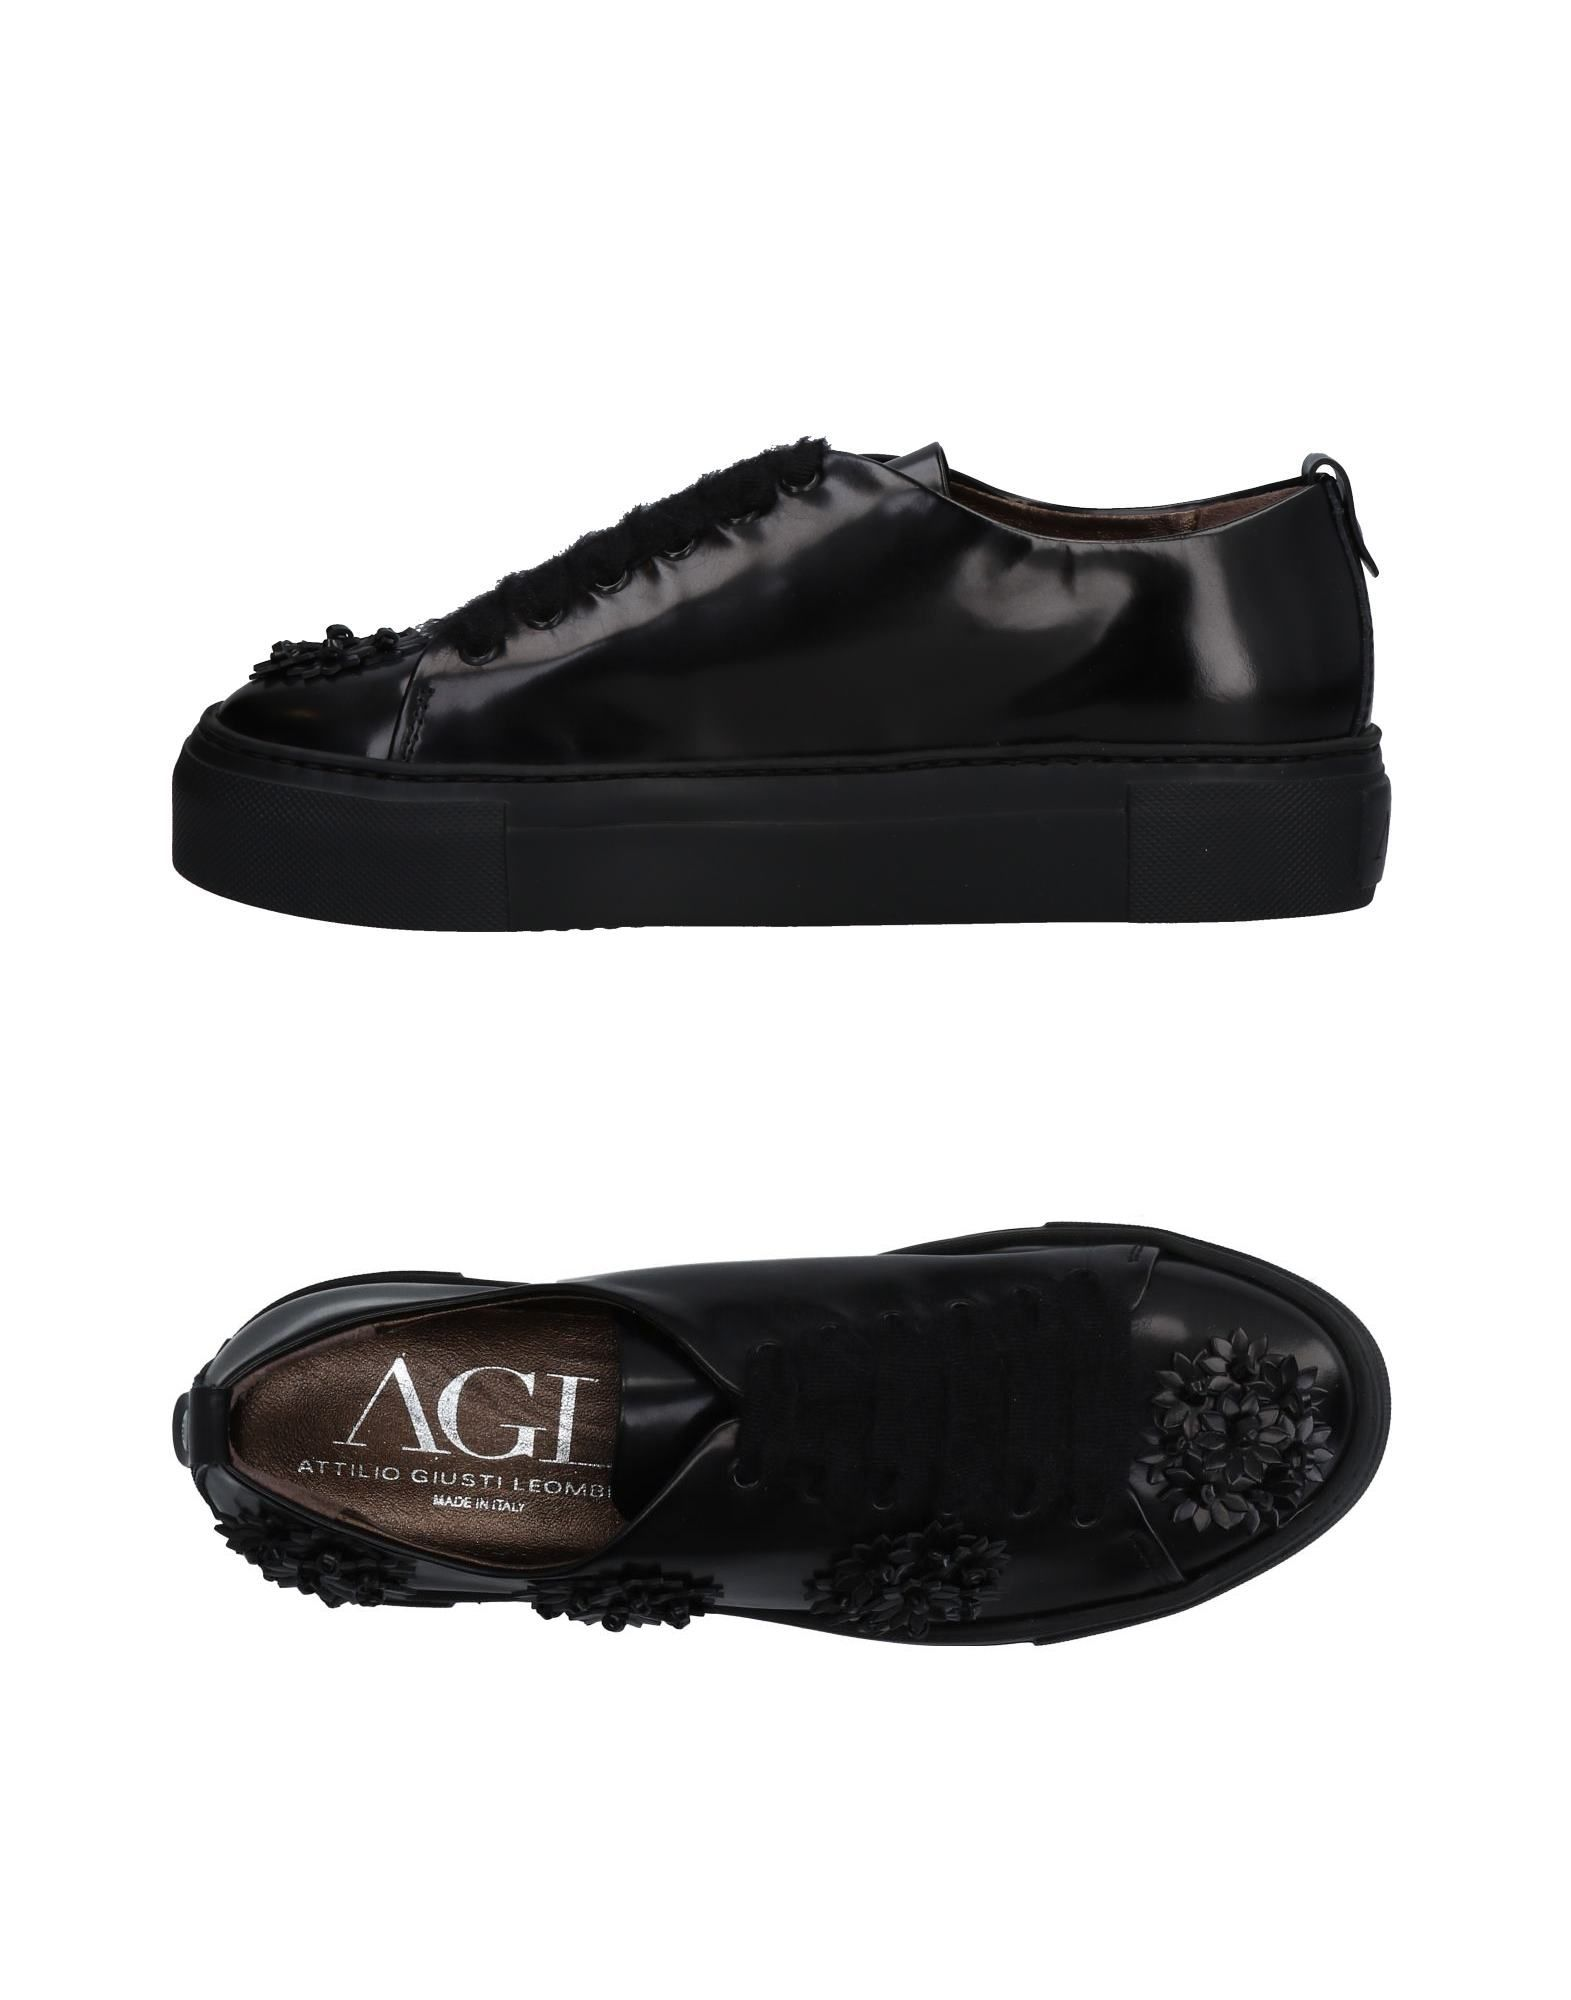 Agl Attilio Giusti Leombruni Sneakers Damen  11470099CG Heiße Schuhe